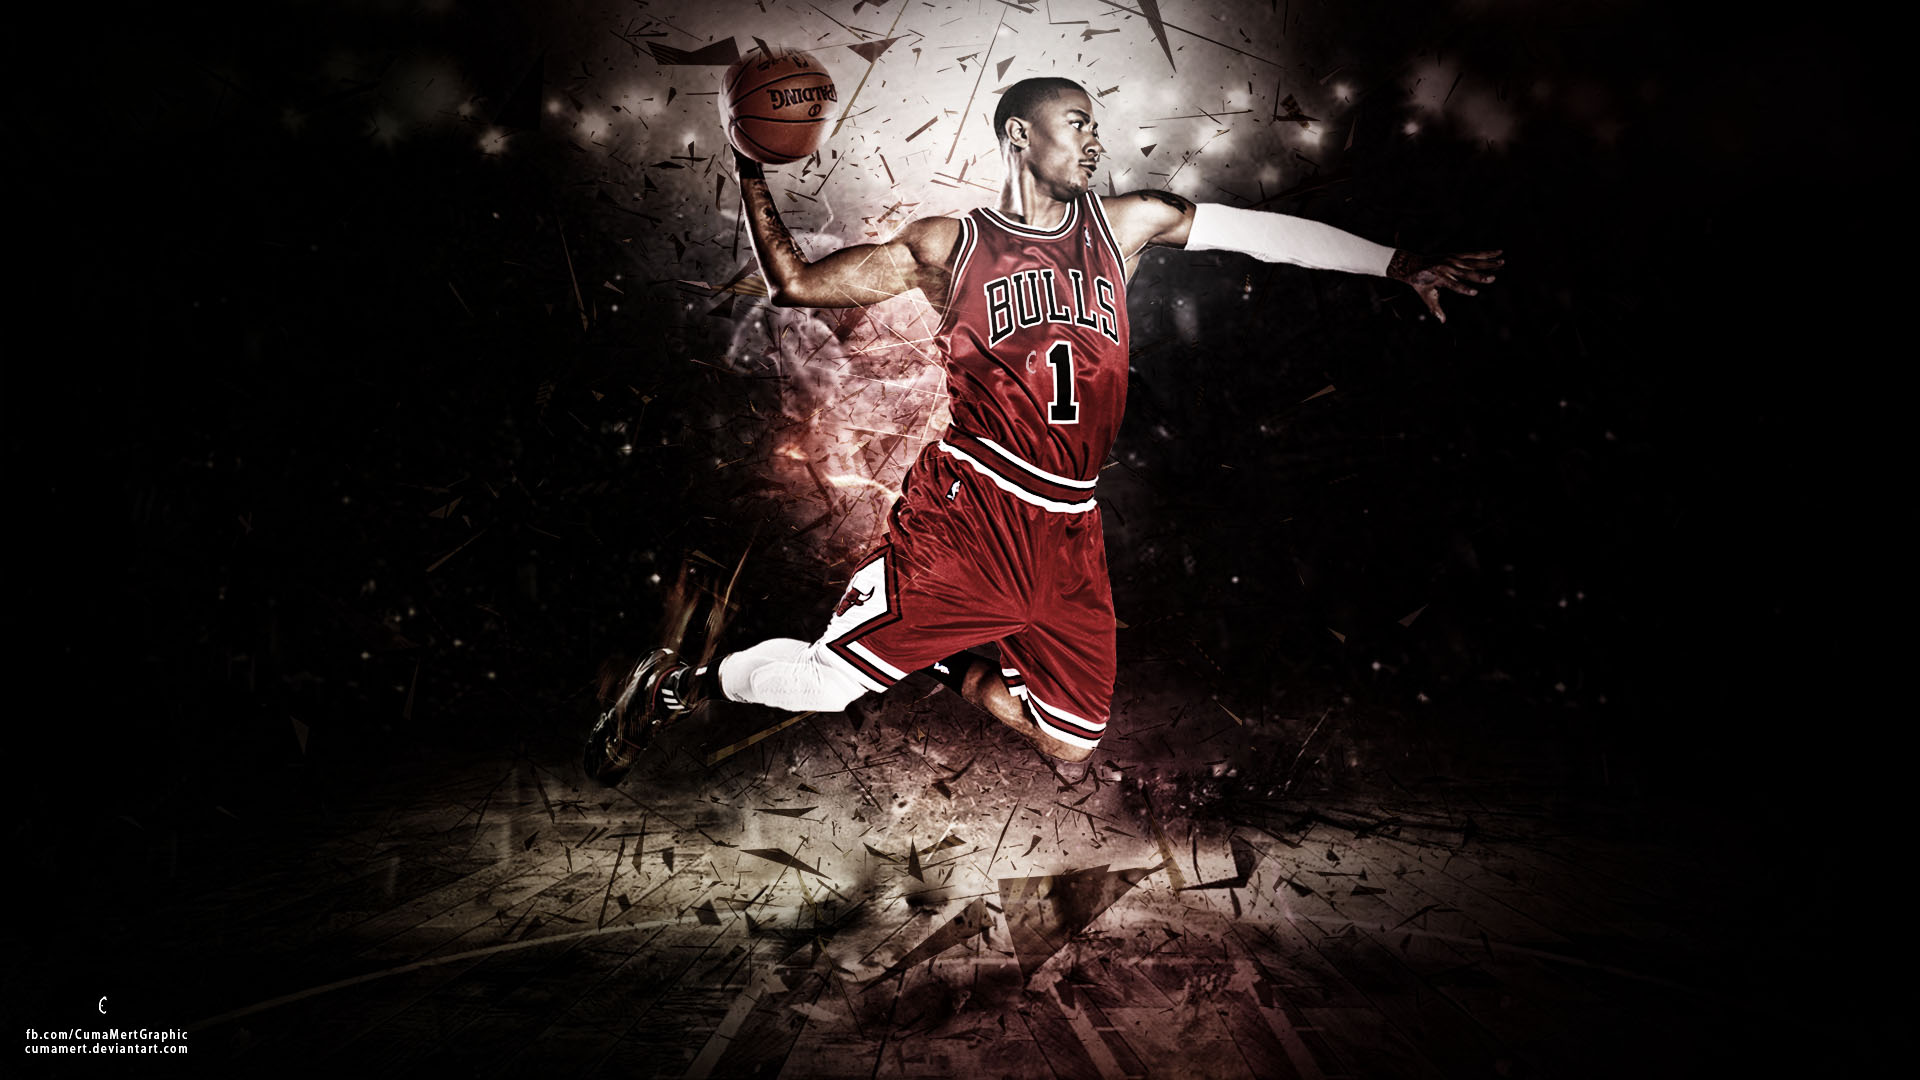 Derrick Rose Dunk On LeBron James   wallpaper 1920x1080